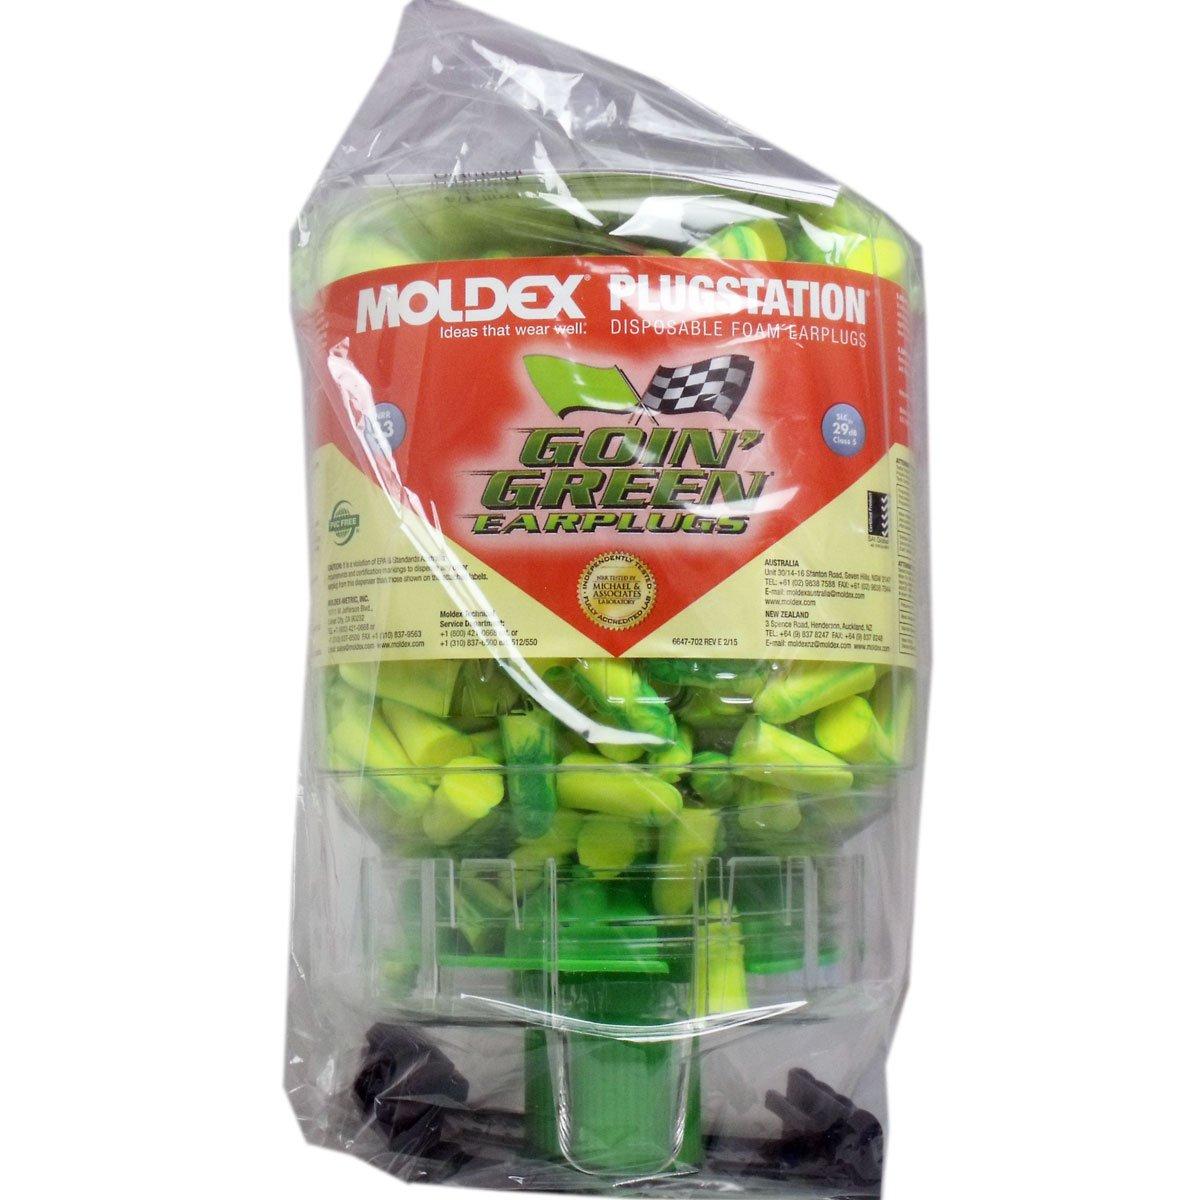 MOLDEX モルデックス 耳栓 ひも無【ゴーイングリーン】プラグステーション ディスペンサー/250ペア B00ZYX6VF6